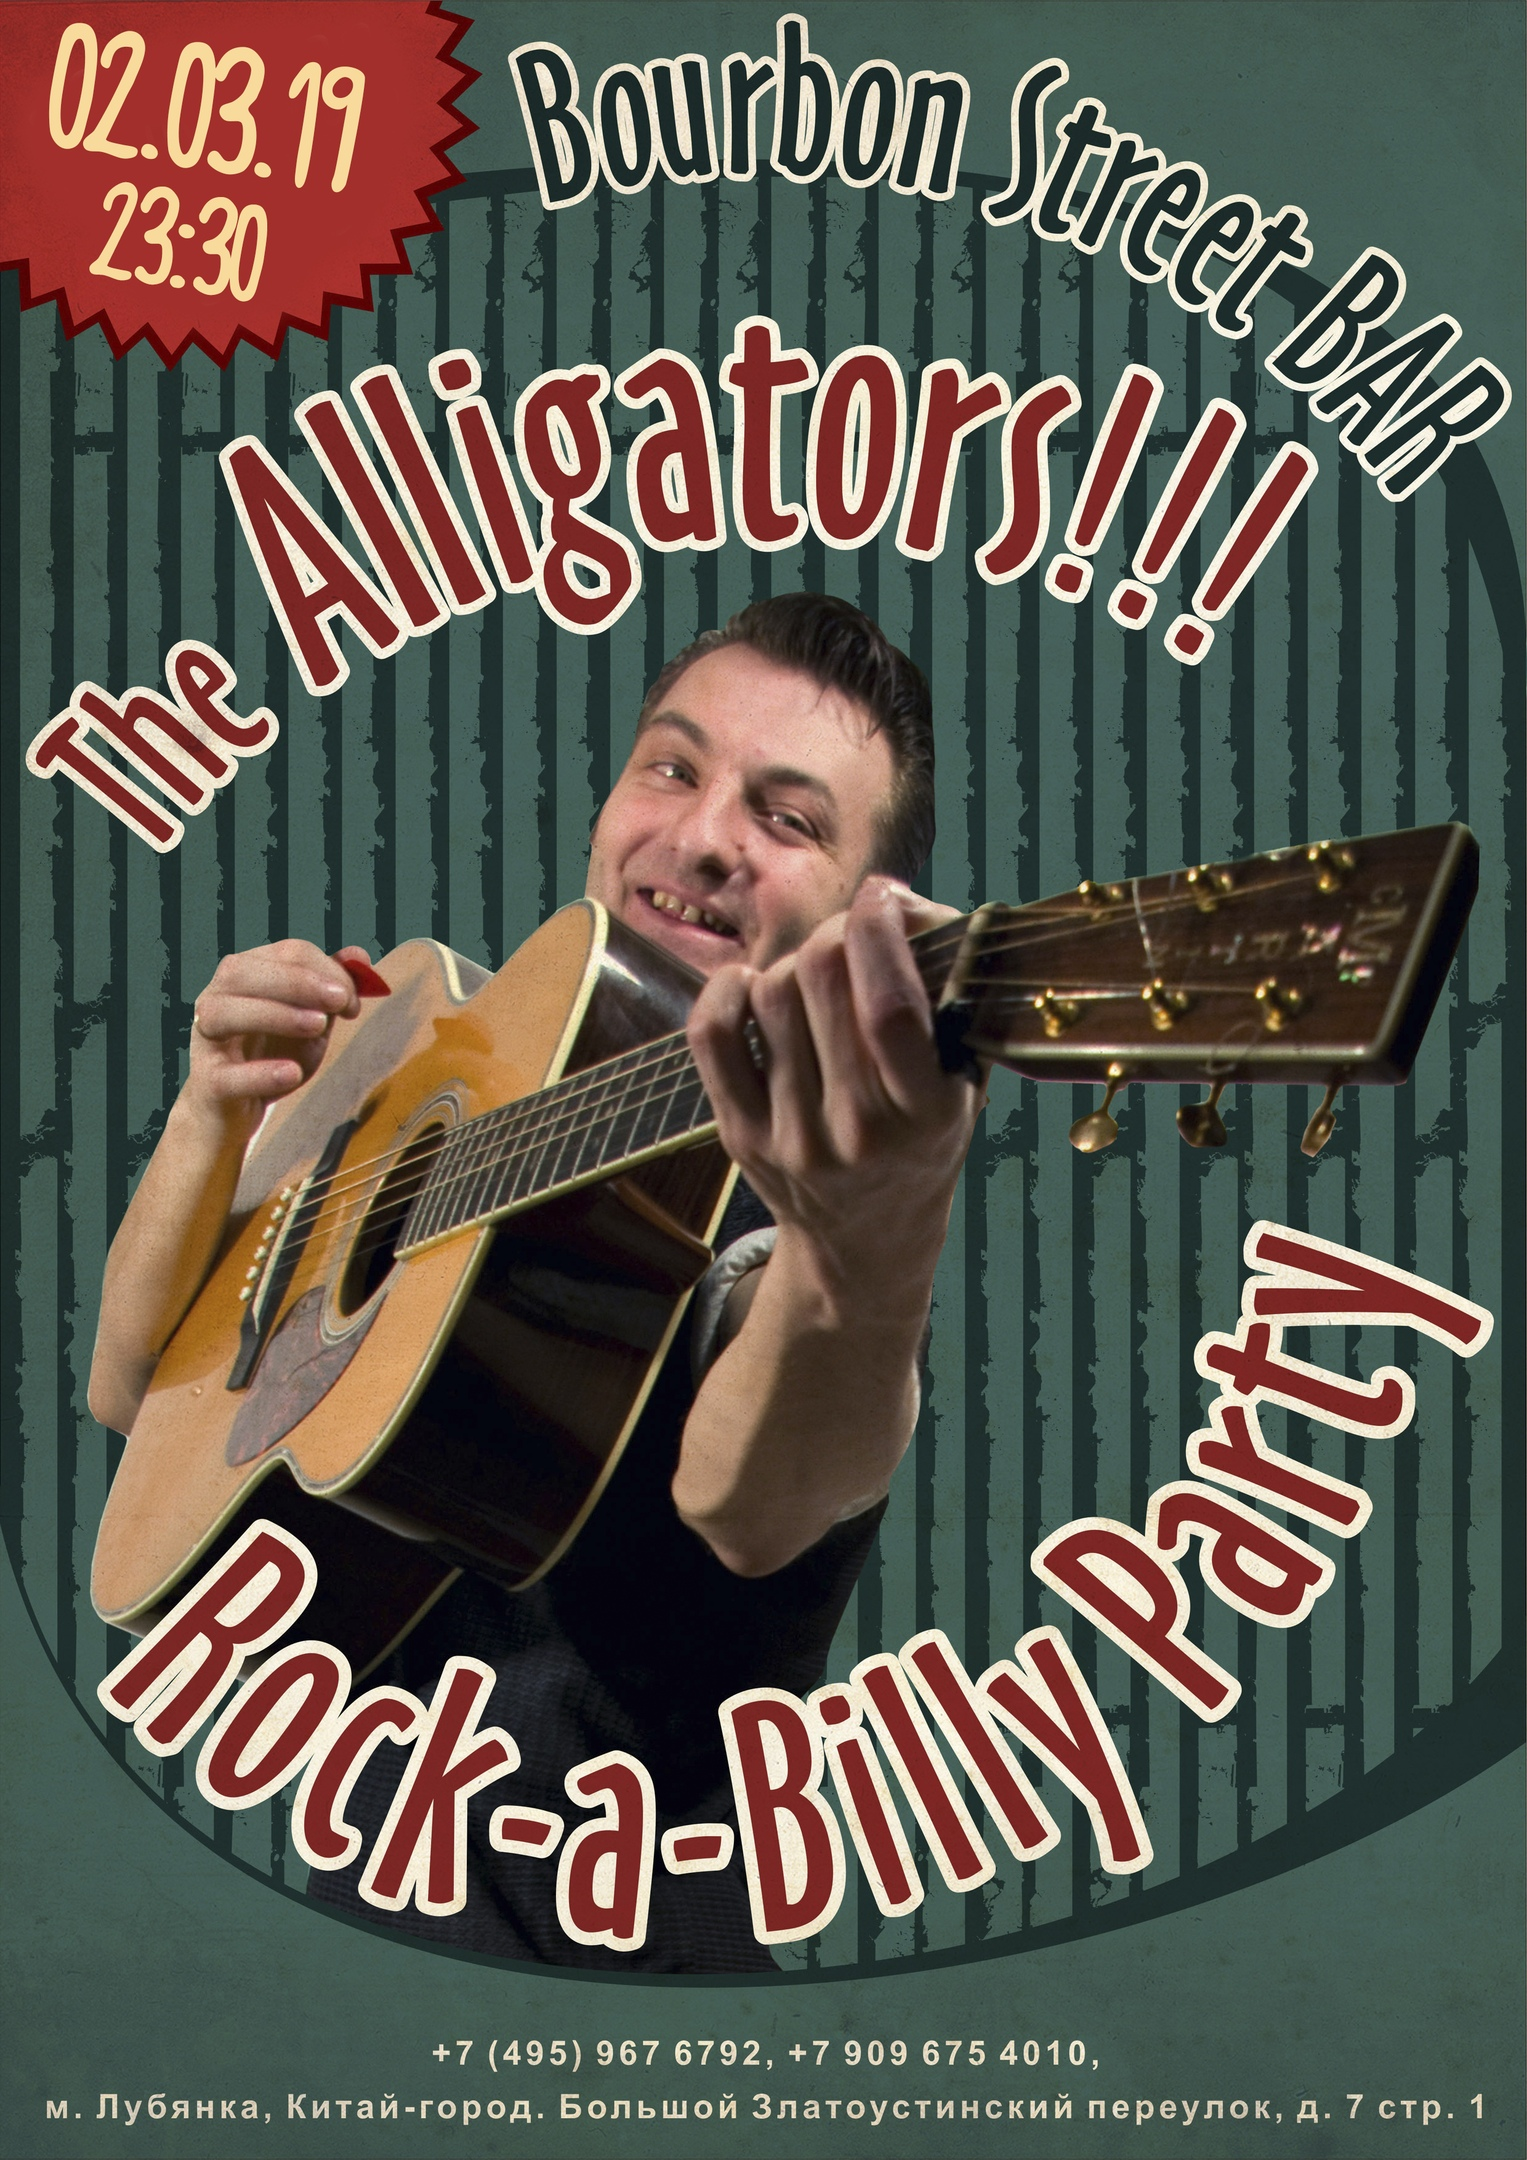 02.03 Alligators в баре Bourbon street!